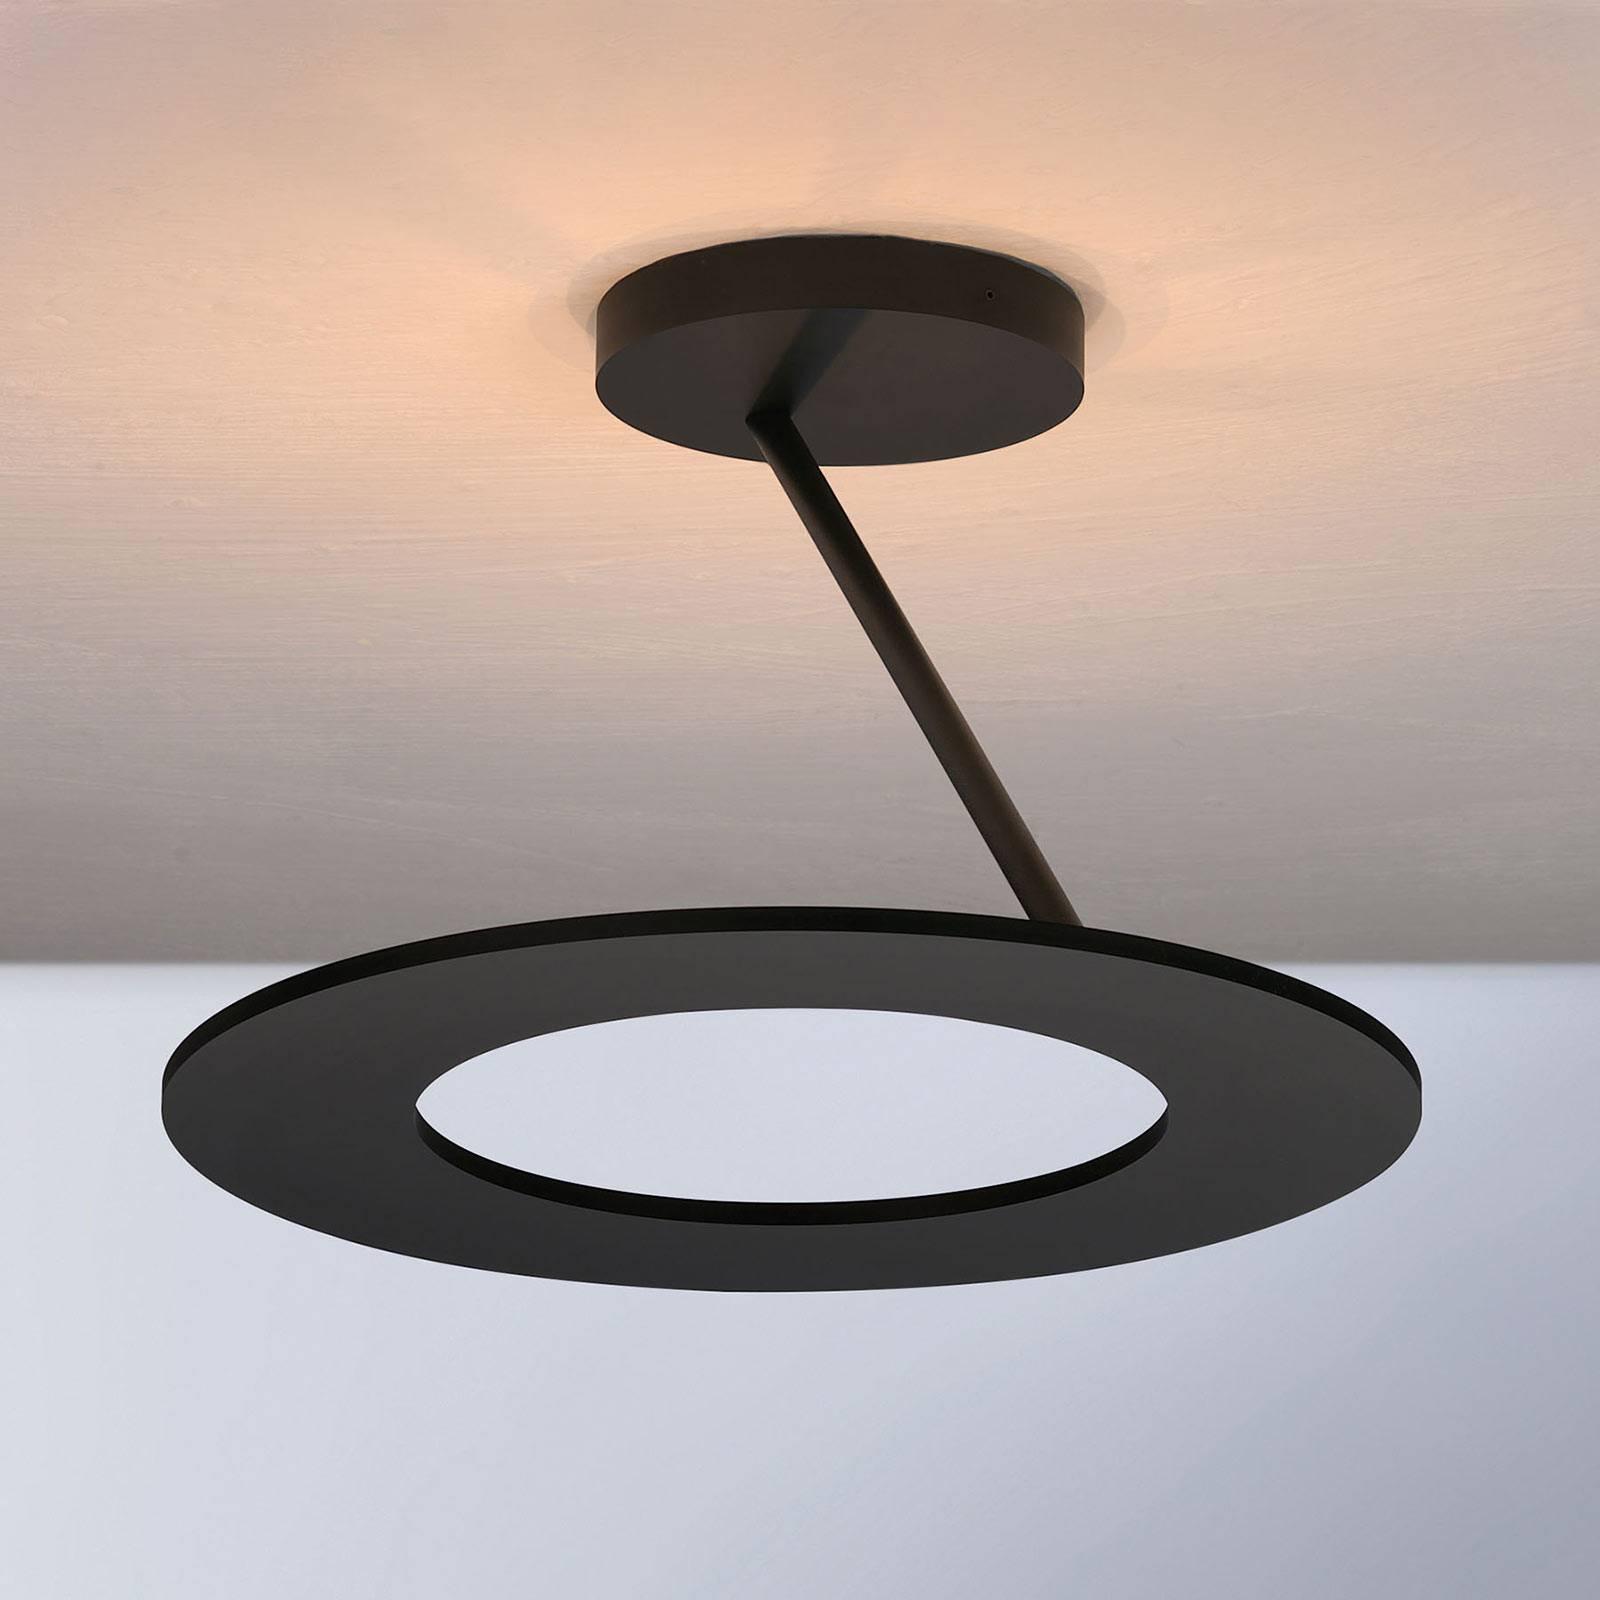 Bopp Stella plafondlamp 1ring Ø 30cm zwart